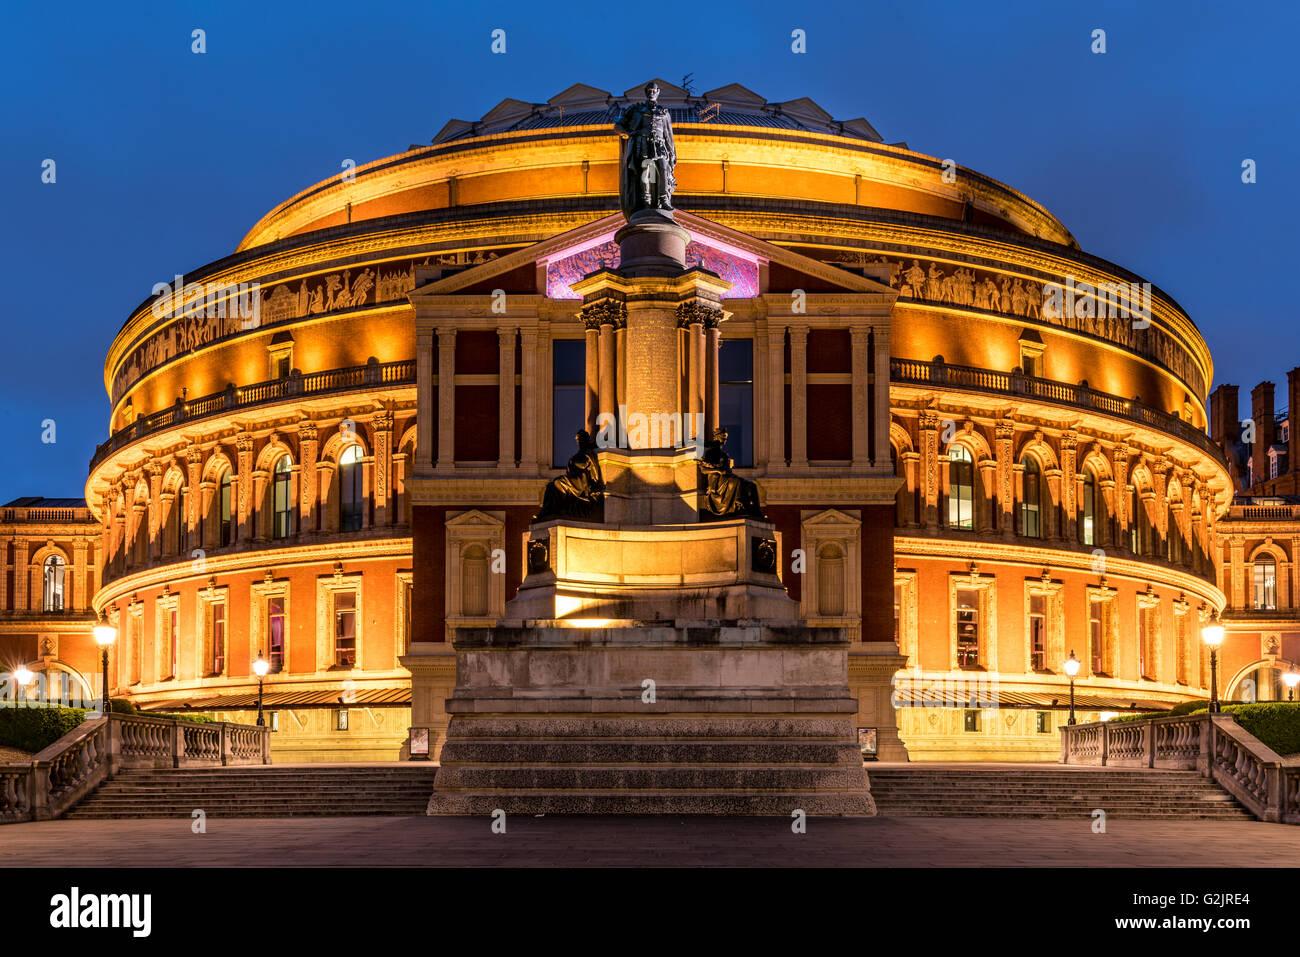 Royal Albert Hall in Kensington, London, United Kingdom - Stock Image